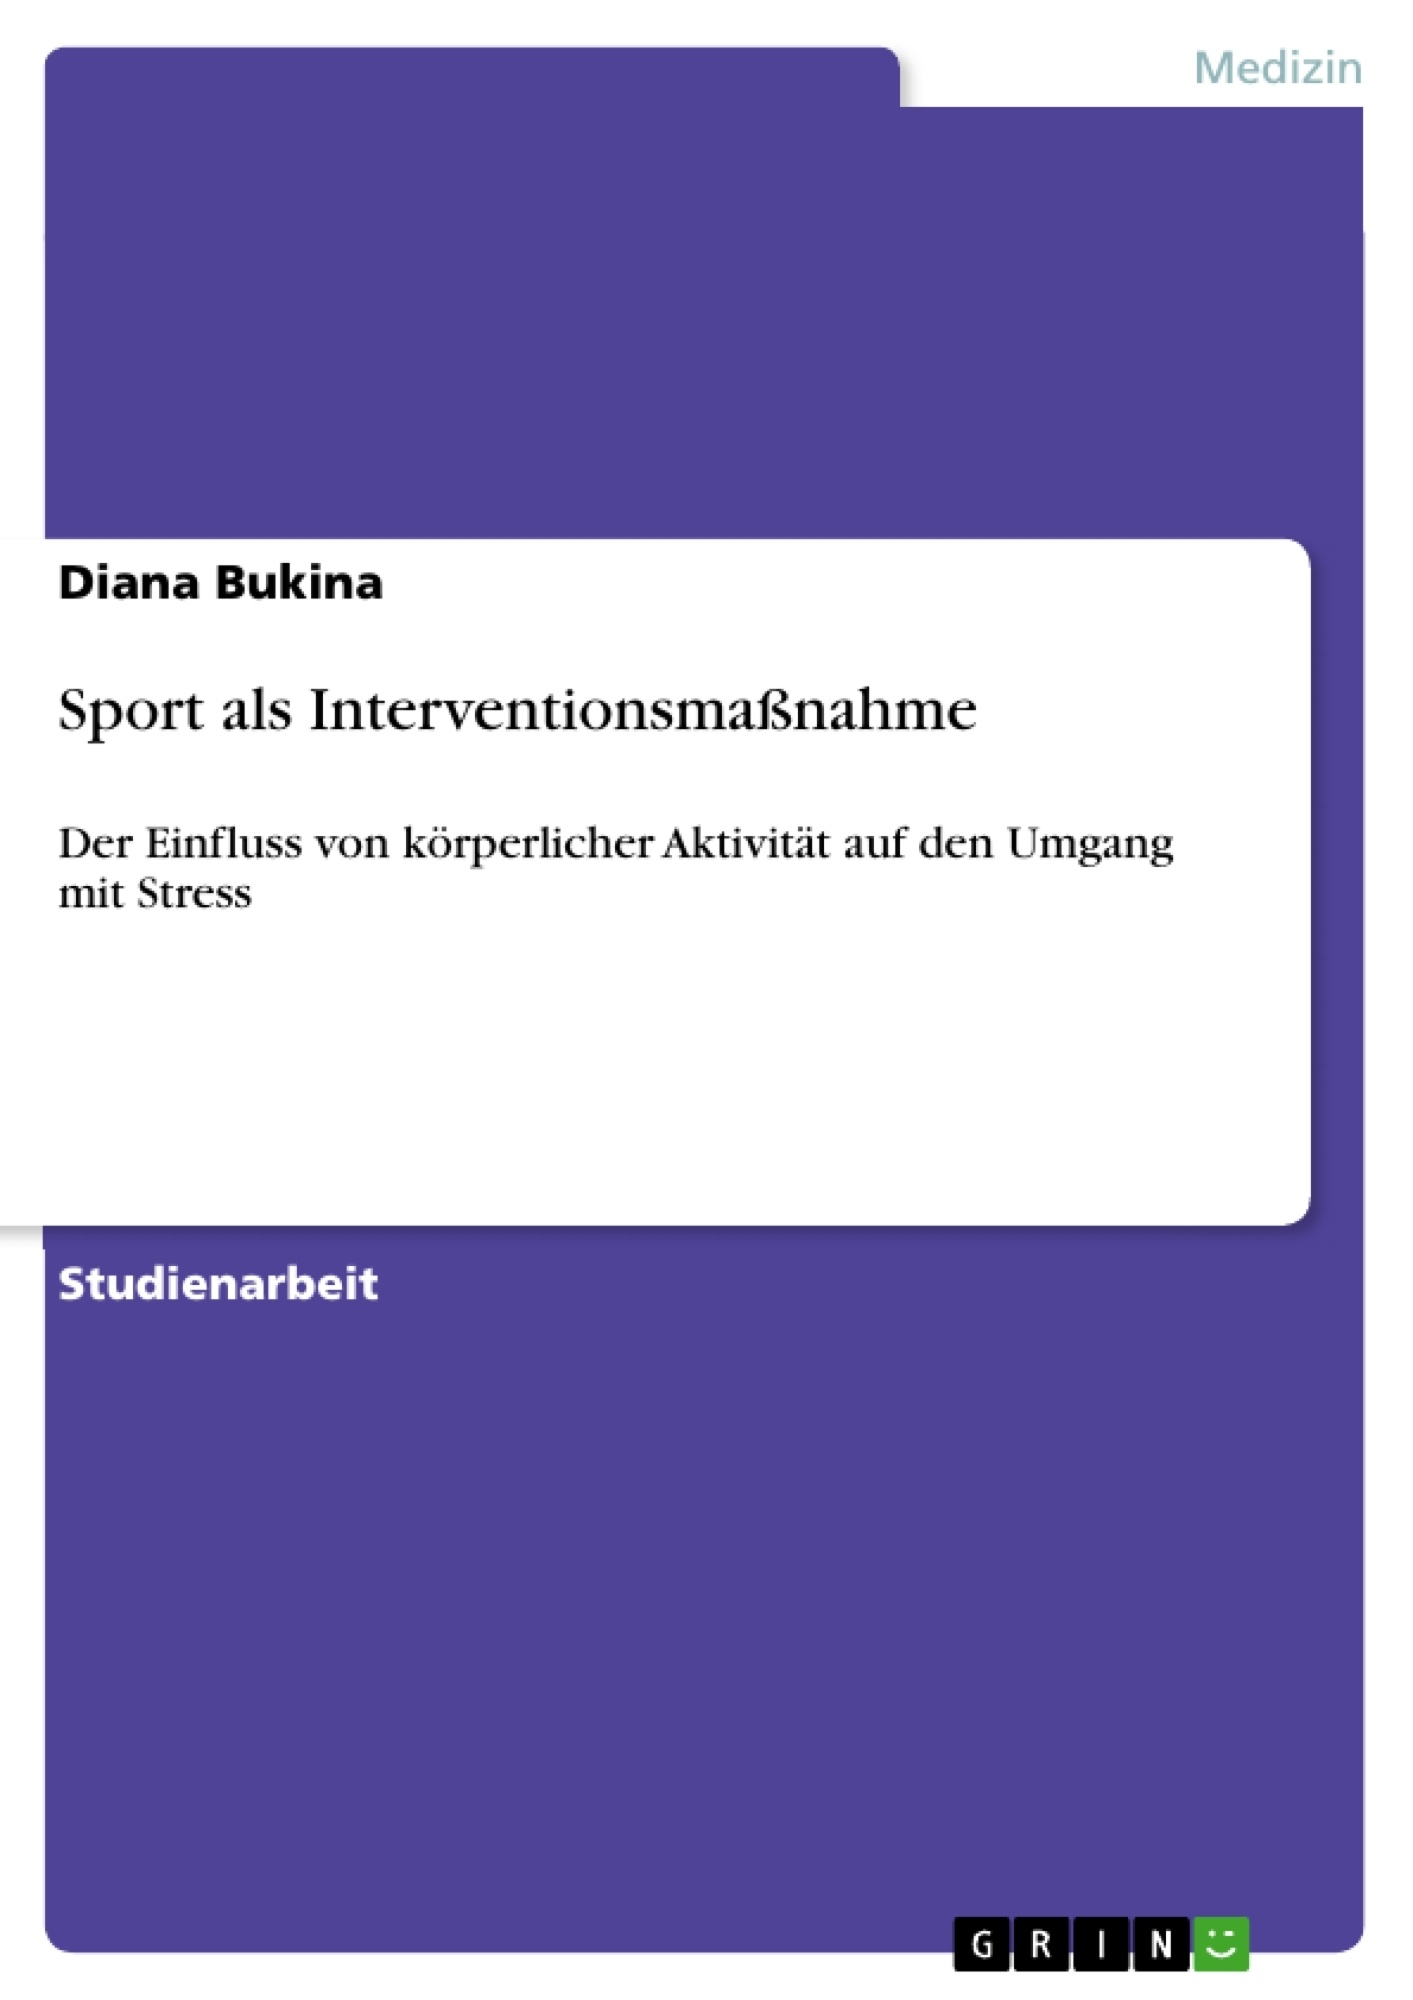 Titel: Sport als Interventionsmaßnahme